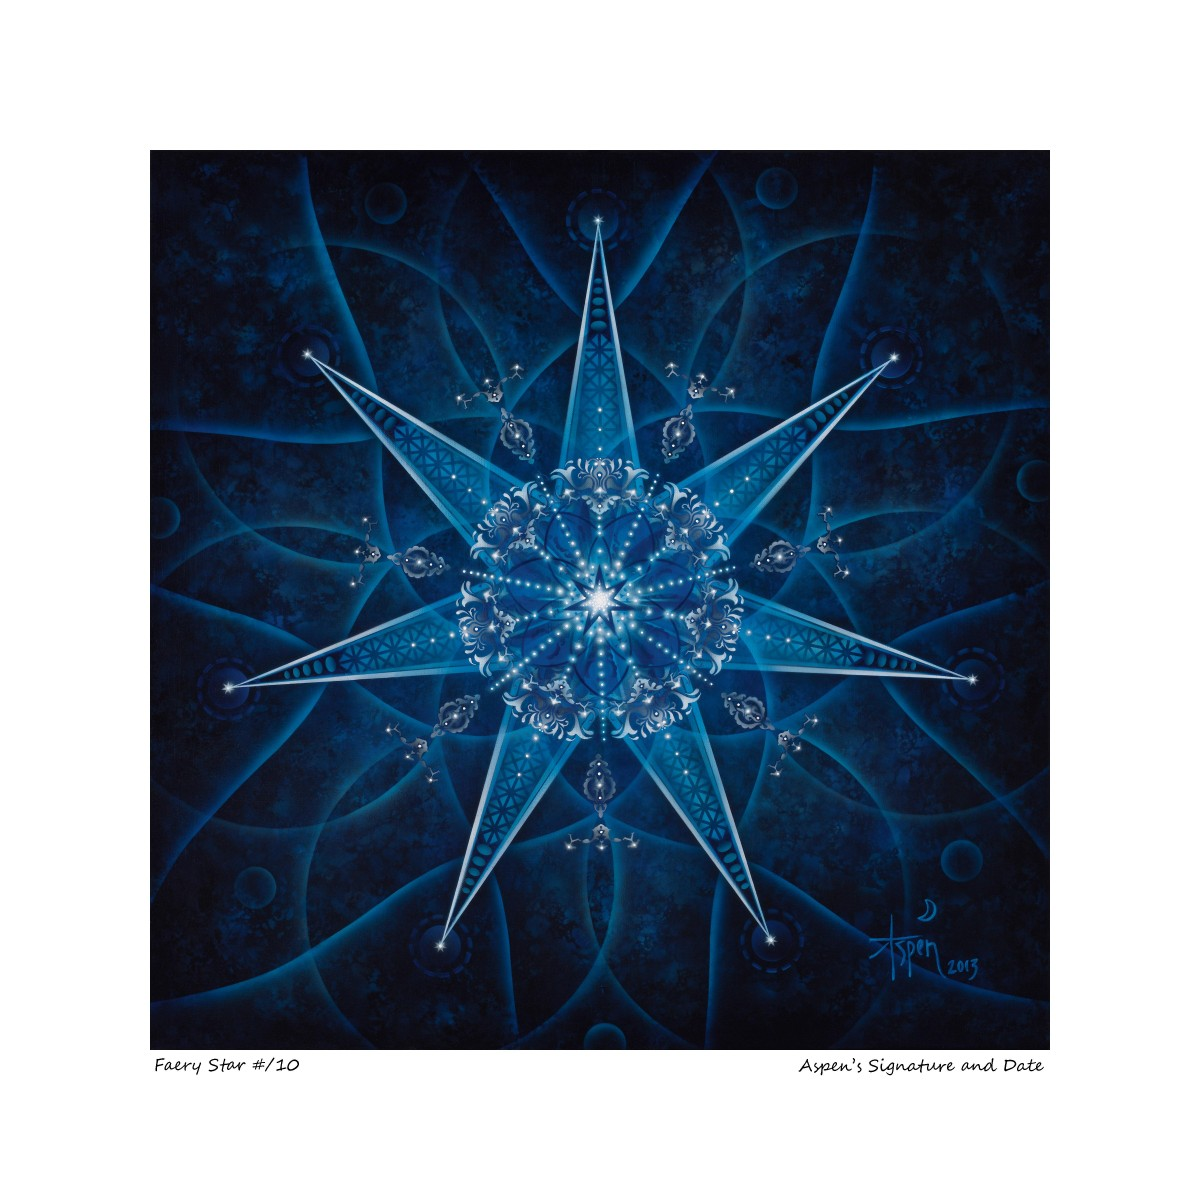 Faery Star Limited Edition Giclée on Fine Art Paper – Framed